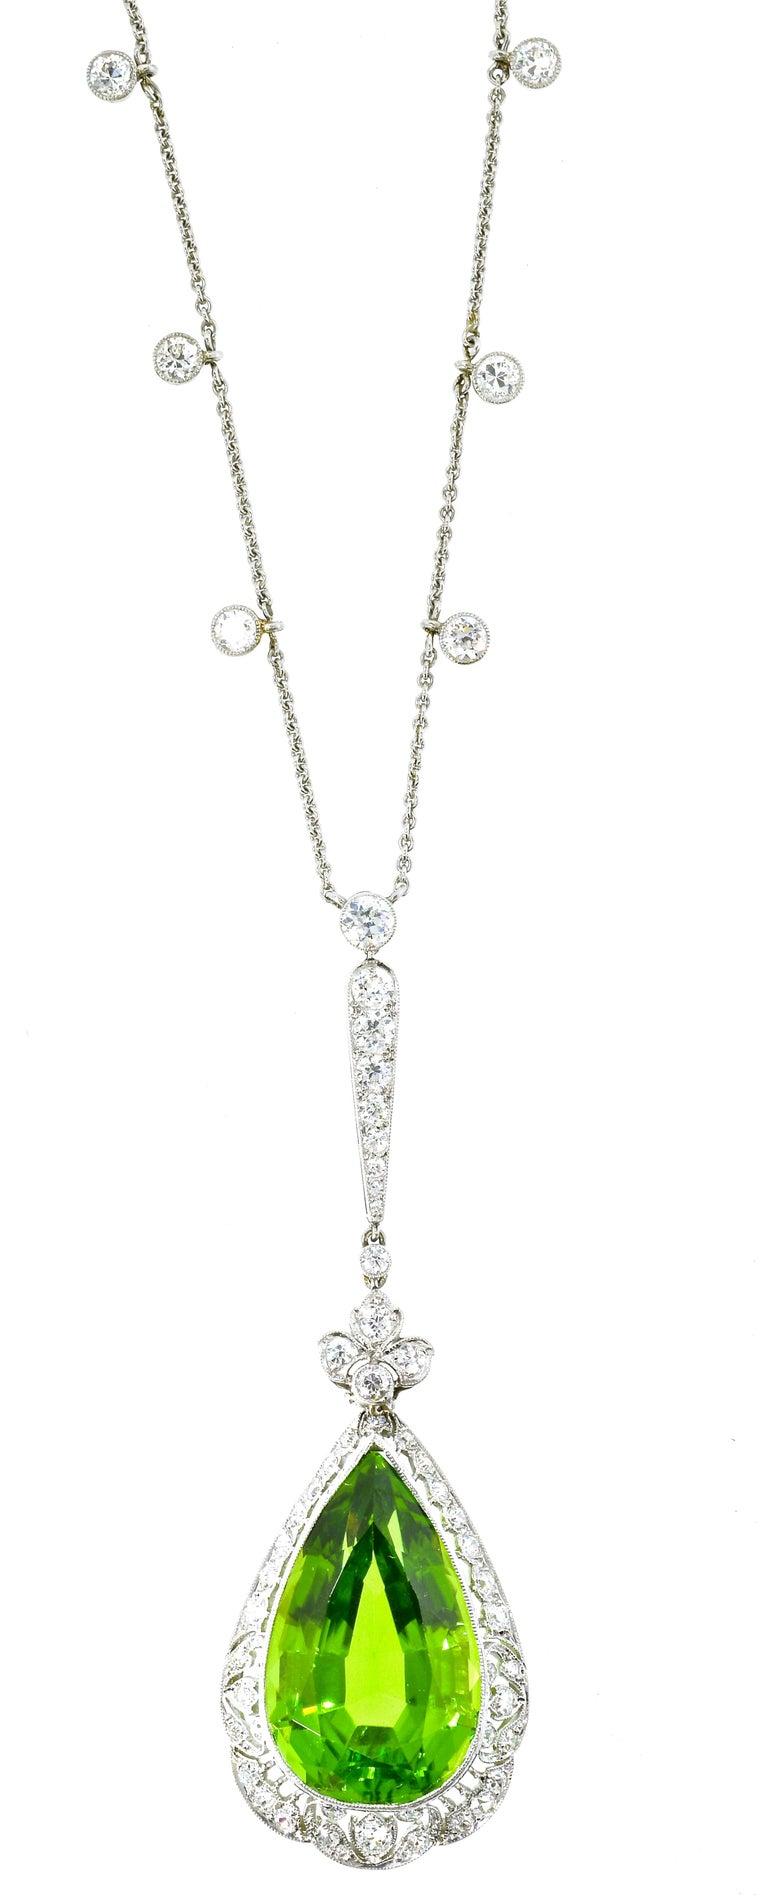 Edwardian Peridot and Diamond Necklace, Shreve & Co., circa 1918 For Sale 9